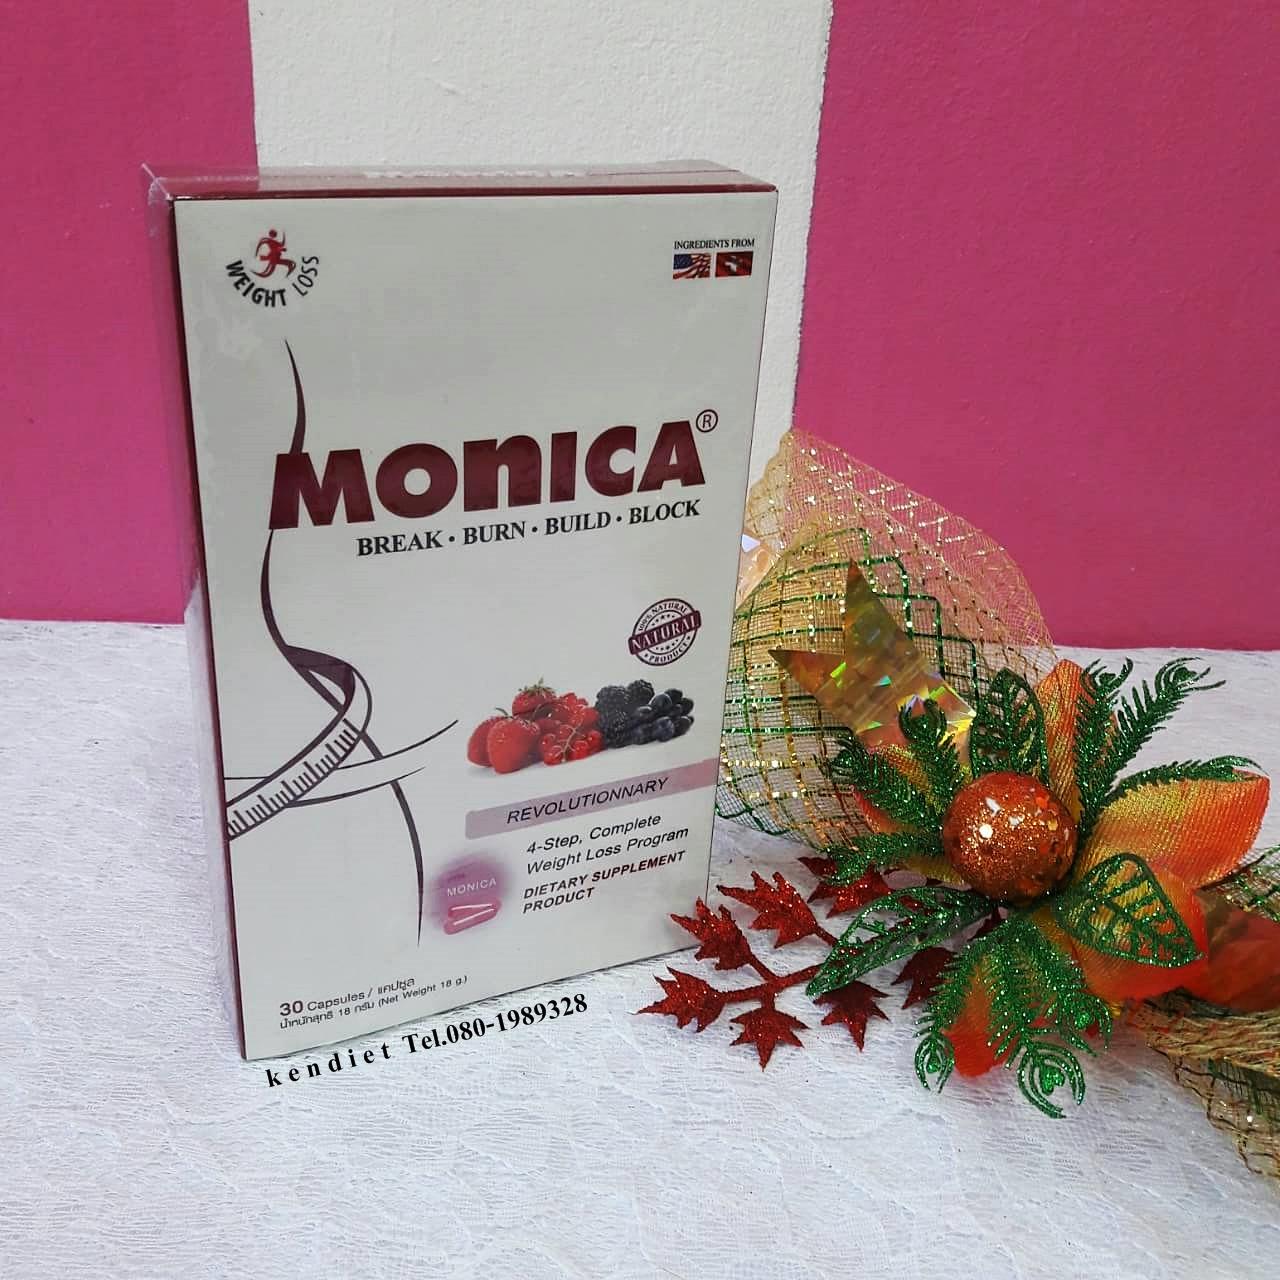 Monica โมนิก้า Monica อาหารเสริมลดน้ำหนัก 490 บาท ขนาด 30 แคปซูล